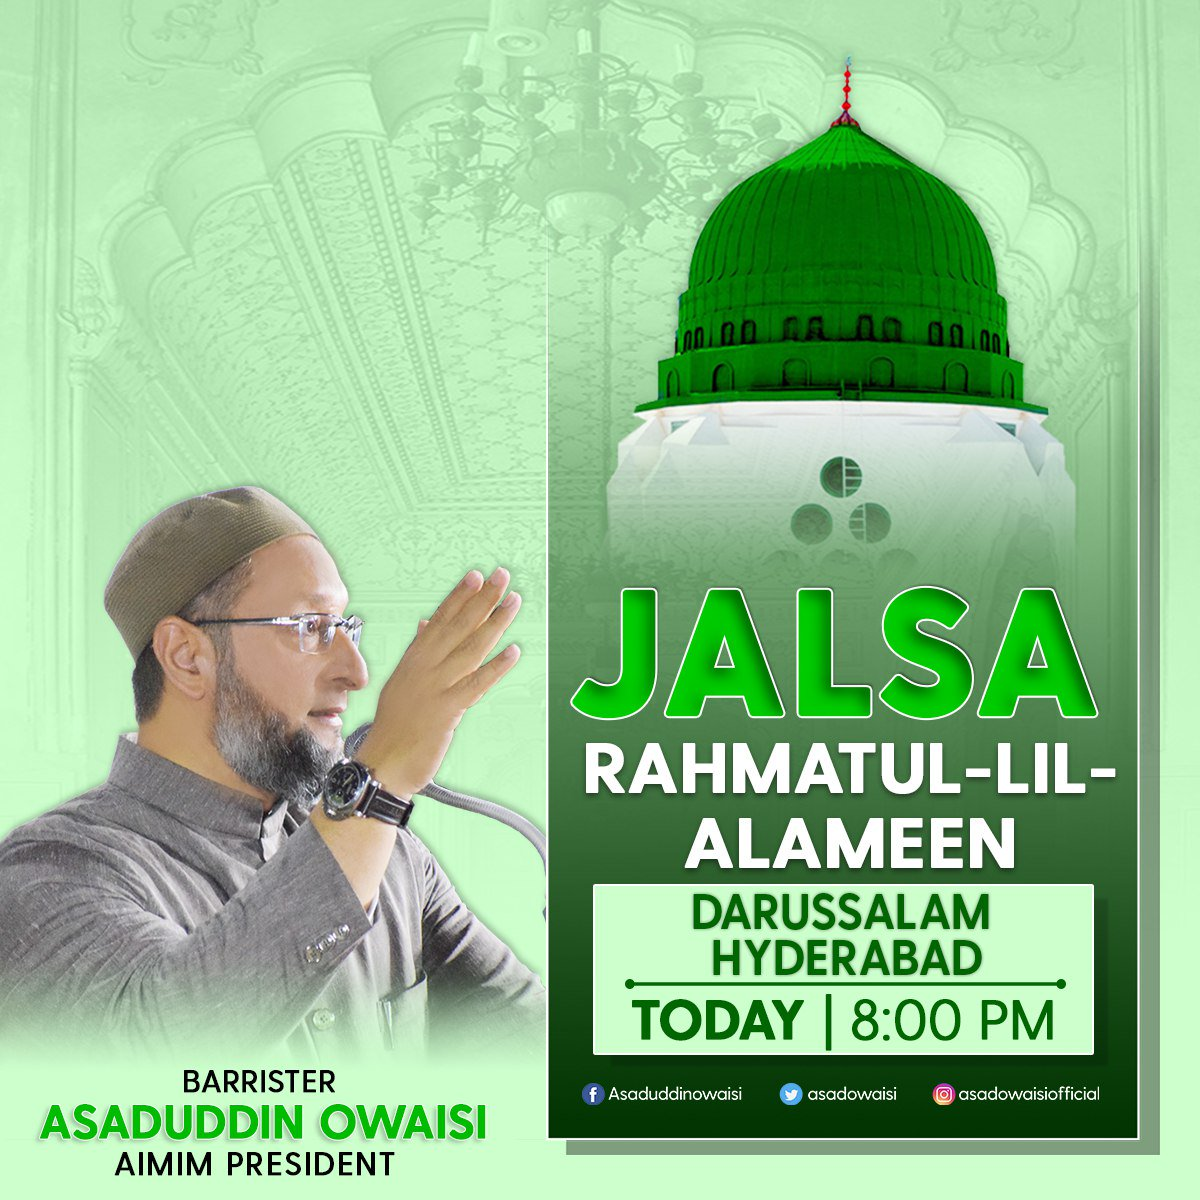 Hazrat Muhammad (S.A.W) ke Yaum-e-Paidaish ki khushimein aaj 8:00 baje Darussalam mein Jalsa Rahamtul-lil-Alameen munaqid kiya gaya hai, jis mein @asadowaisi aur ilaqai wa bairooni ulama ka khitab hoga. Aashiqan-e-Rasool se guzarish hai ki zyada se zyada tadad mein shirkat karen.